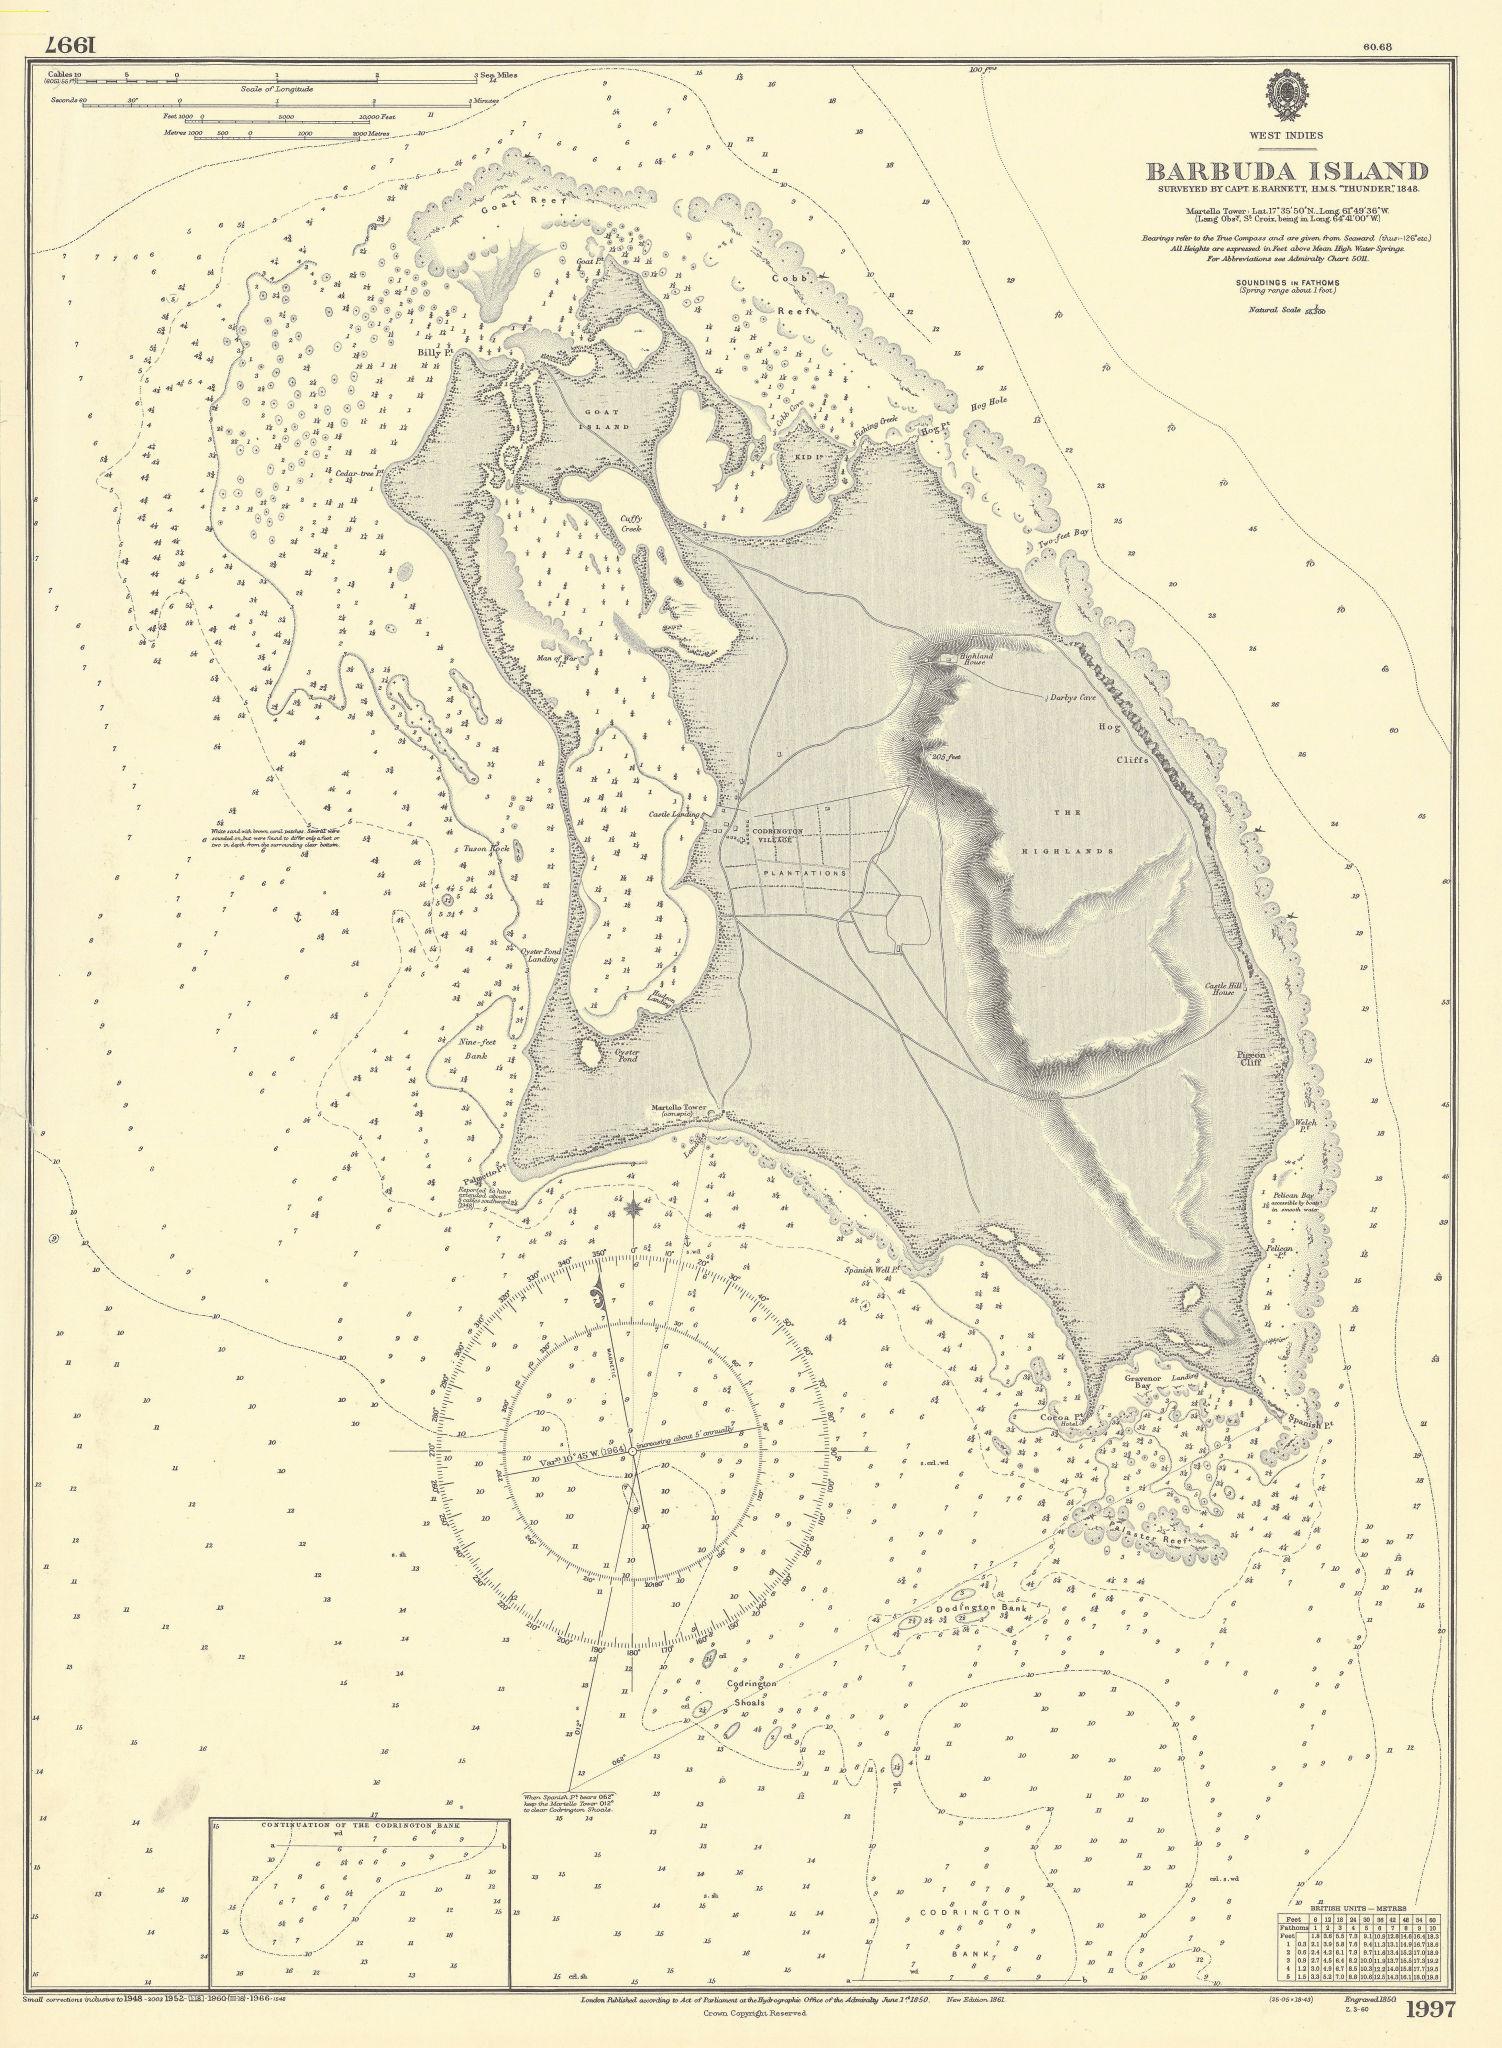 Barbuda Island. West Indies Caribbean. ADMIRALTY sea chart 1850 (1966) old map